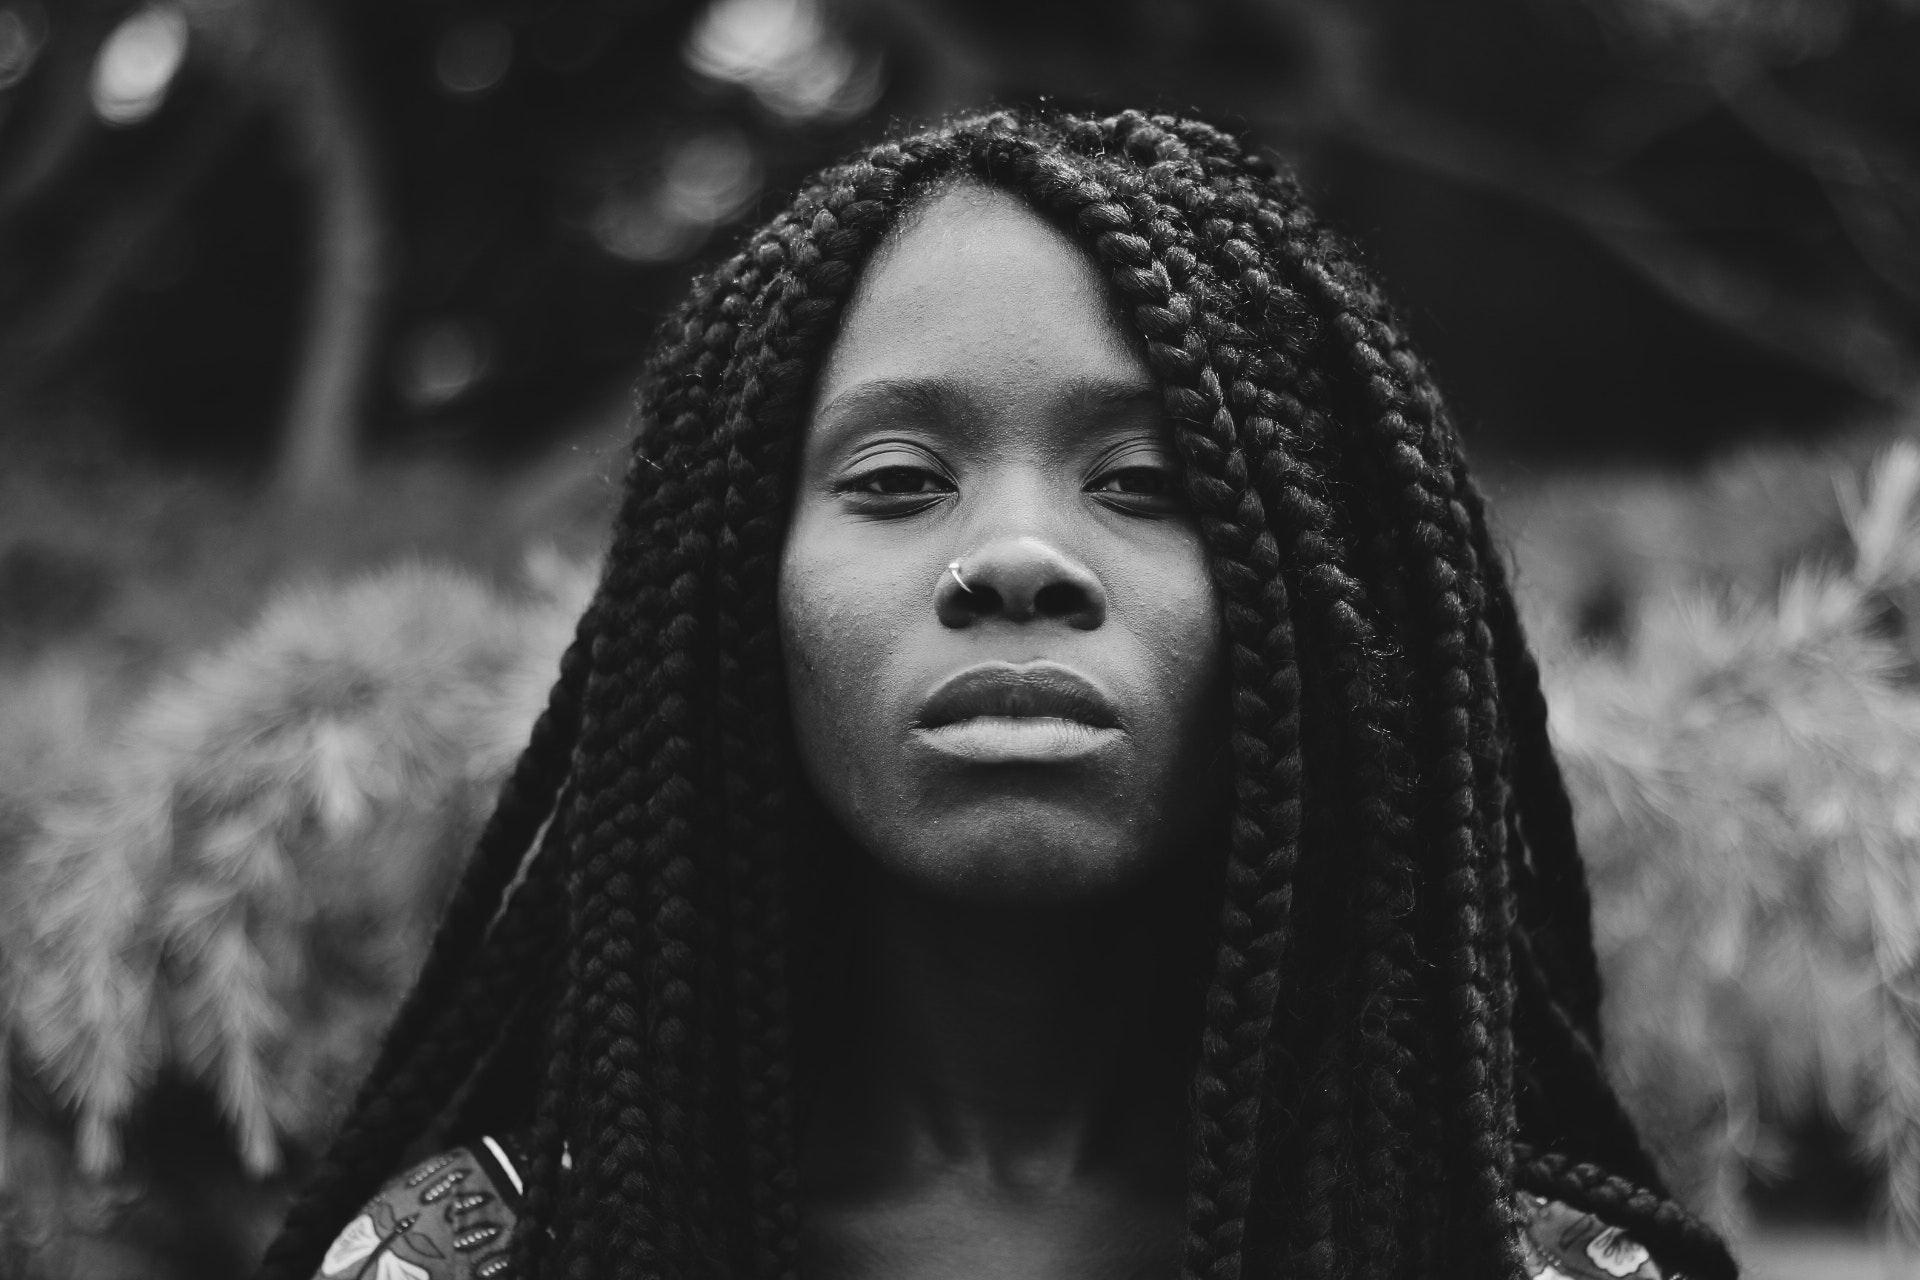 Photo by Ezekixl Akinnewu from Pexels